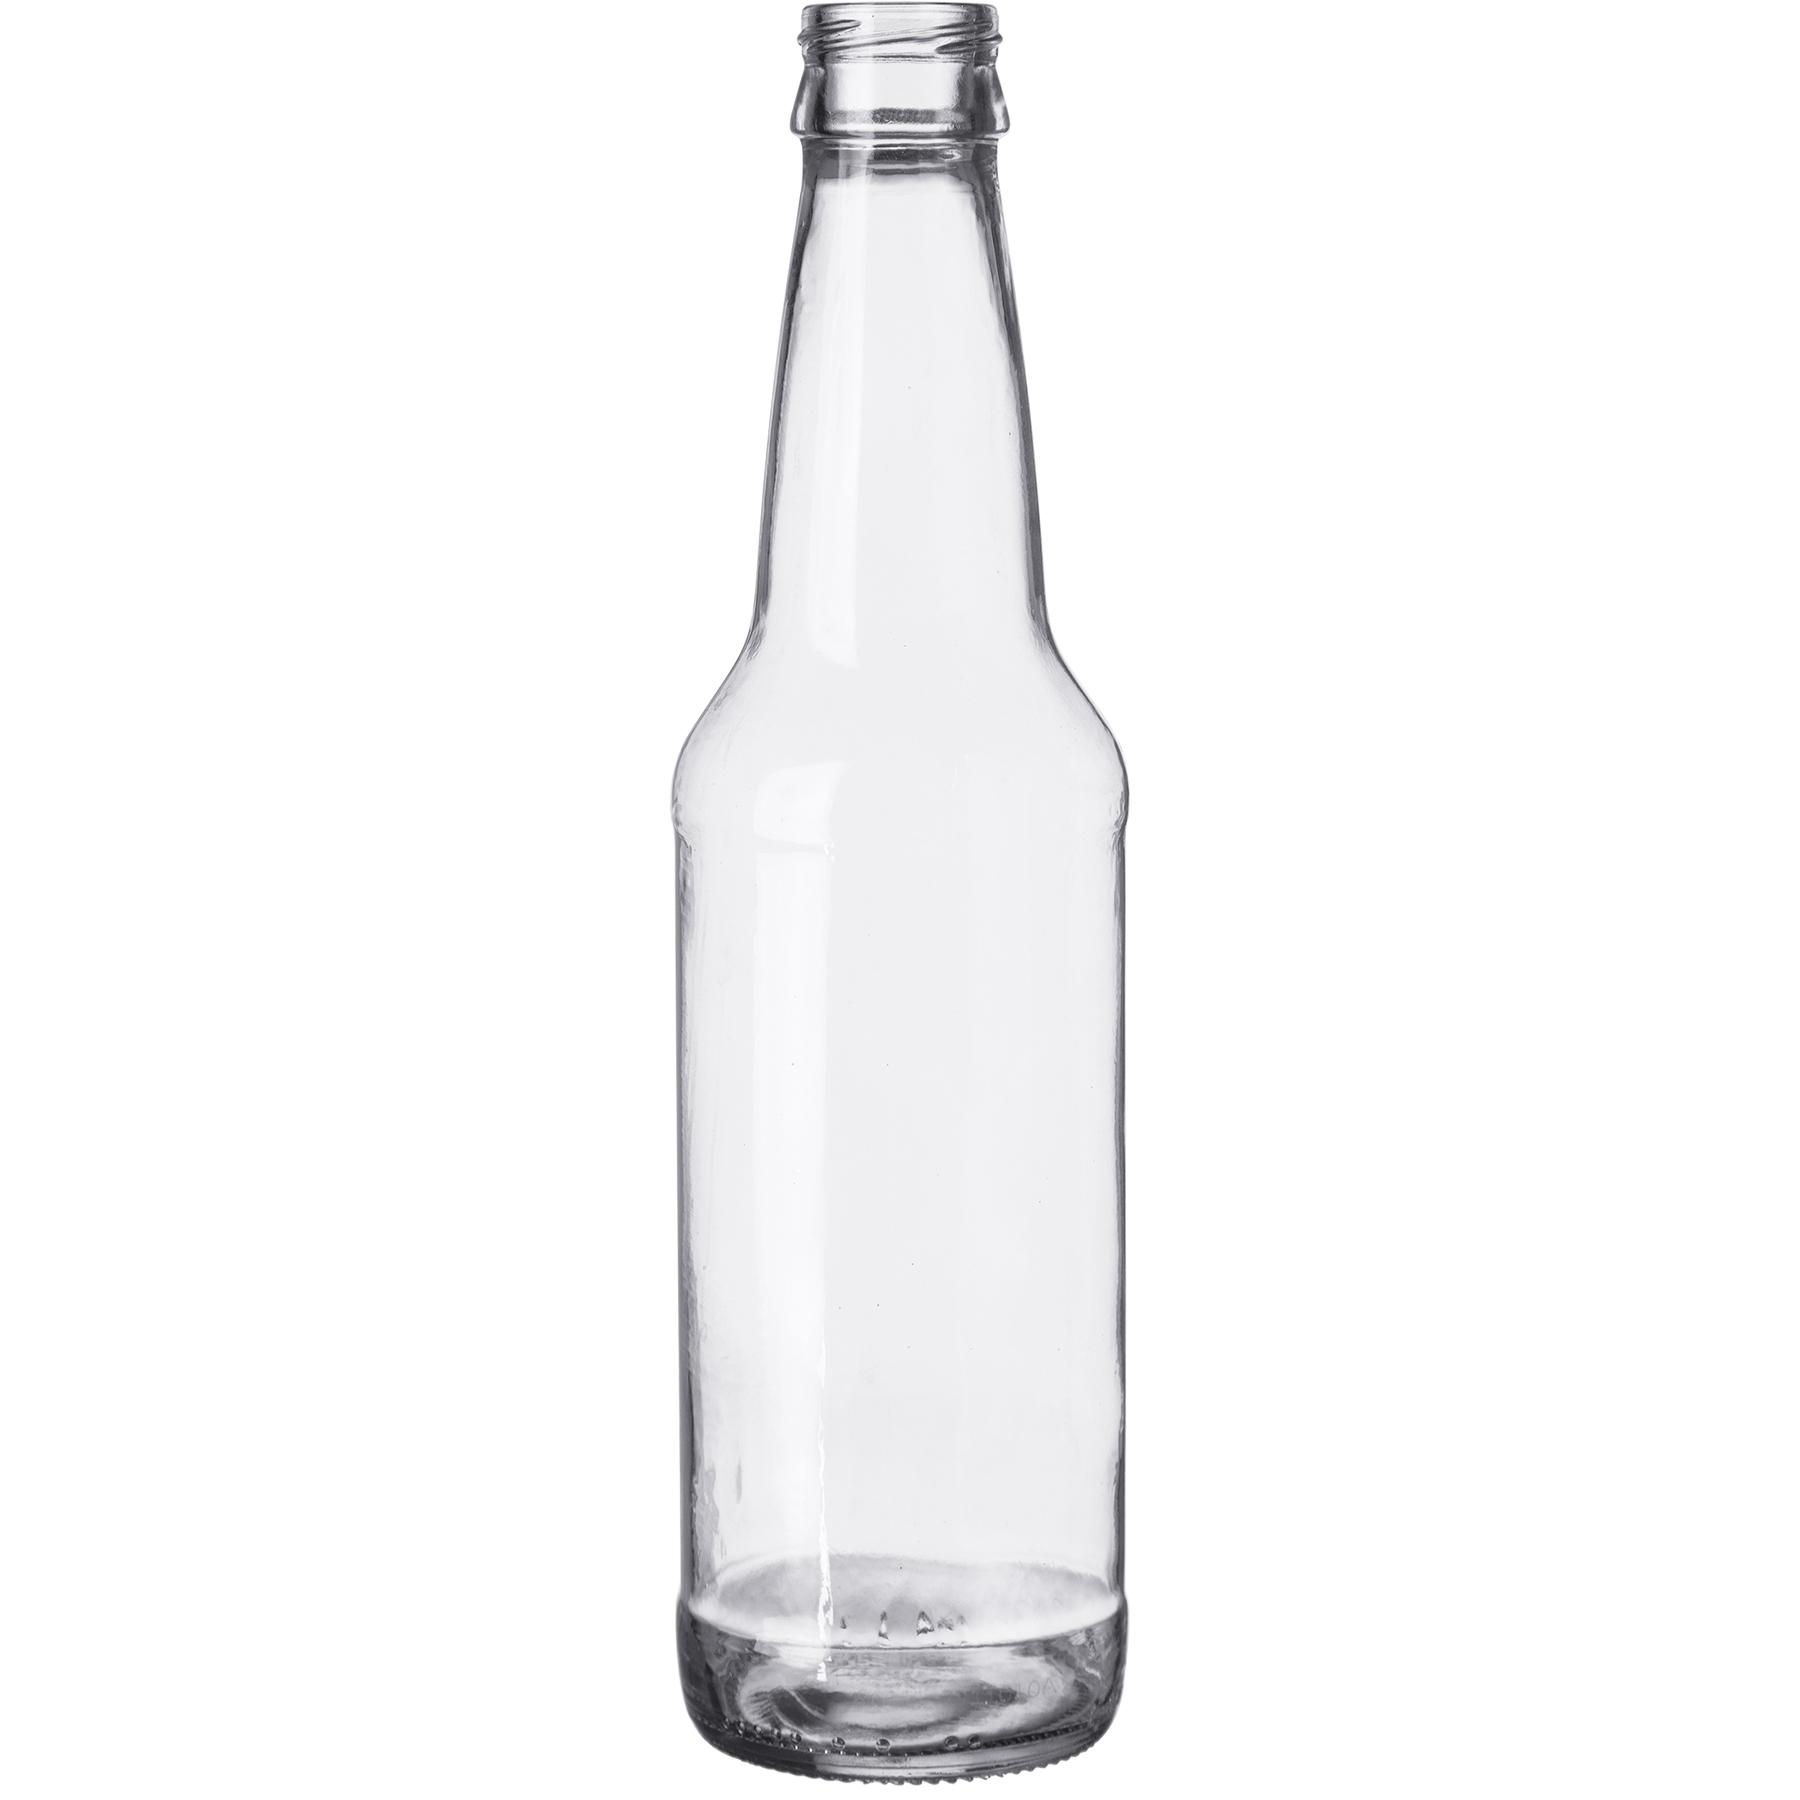 789ee88ad60b 12 oz. (355 ml) Clear Glass Long Neck Beer Bottle, Crown Twist-Off, 26-502,  24/cs